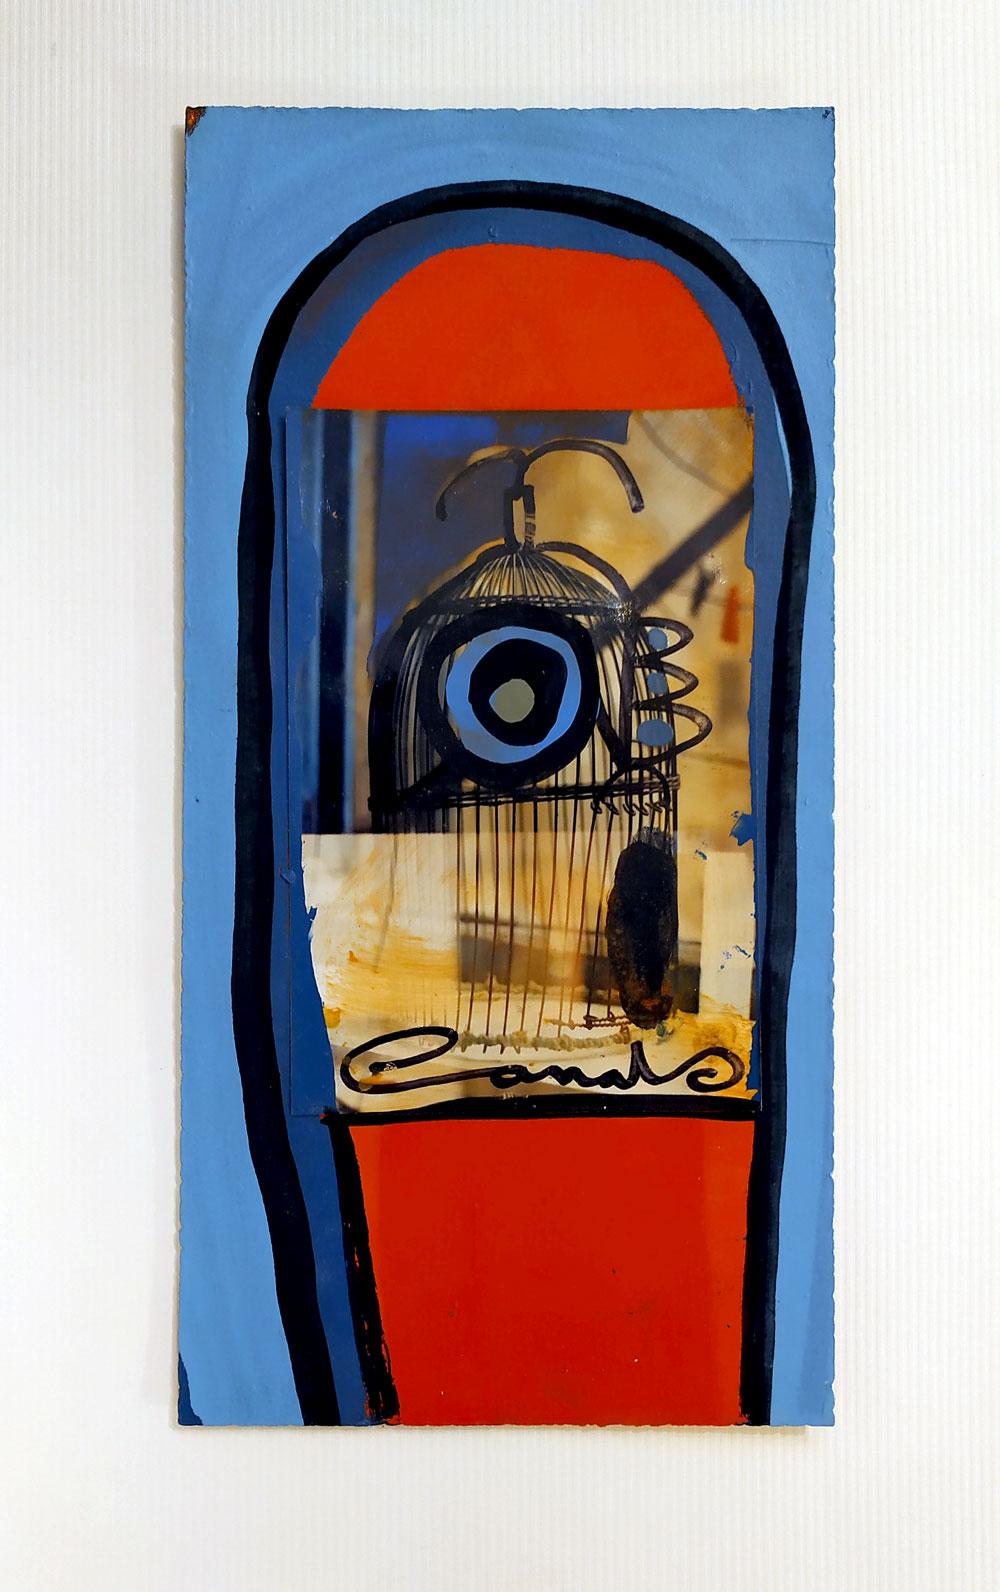 Jaula (2010) - Joan Canals Carreras